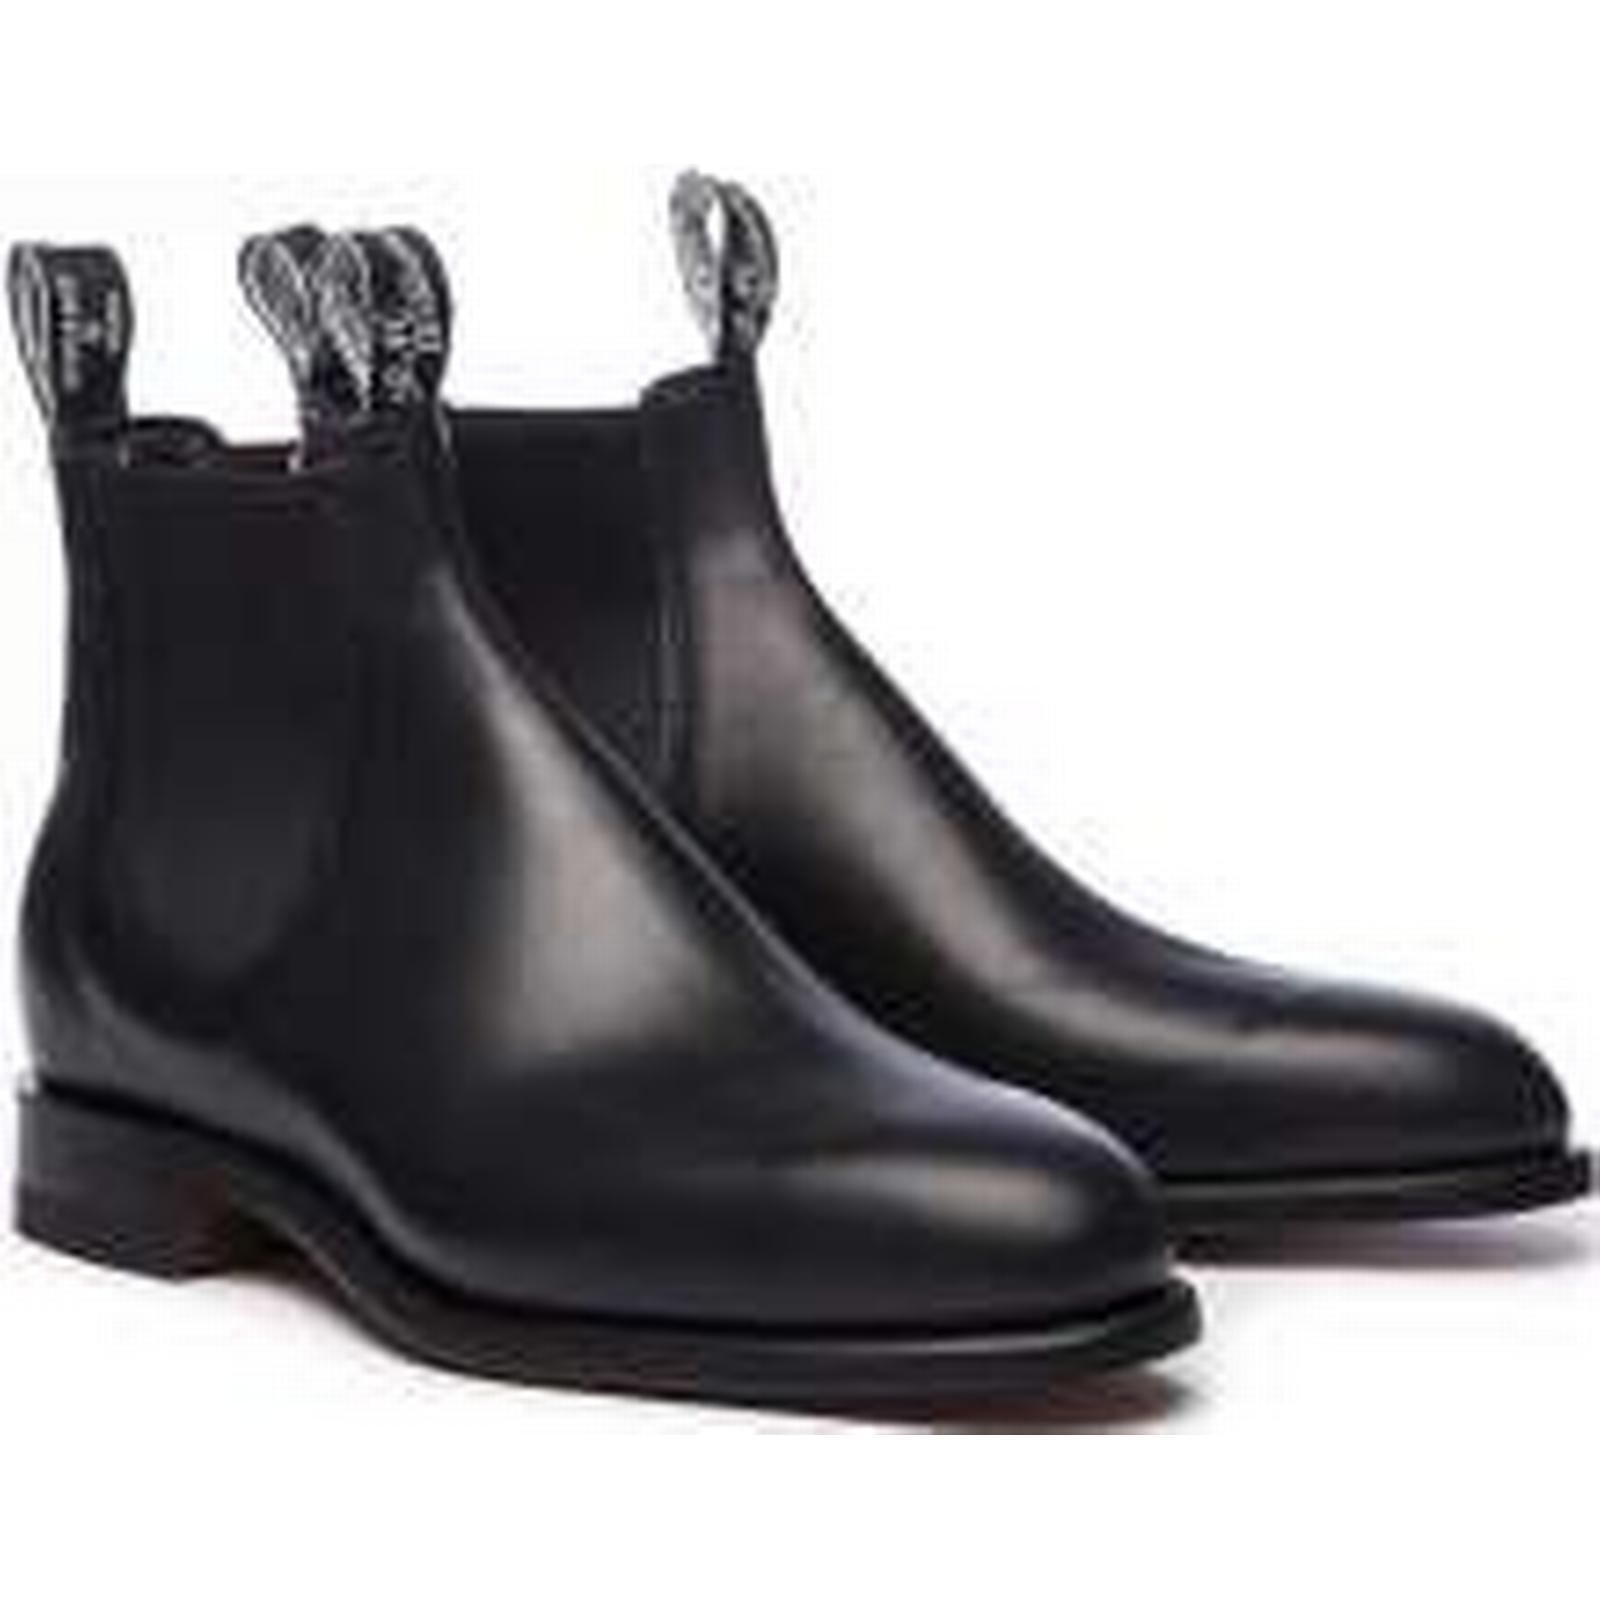 R.M. Williams Classic Boots, Turnout Boots, Classic Black, UK7 1c98e2